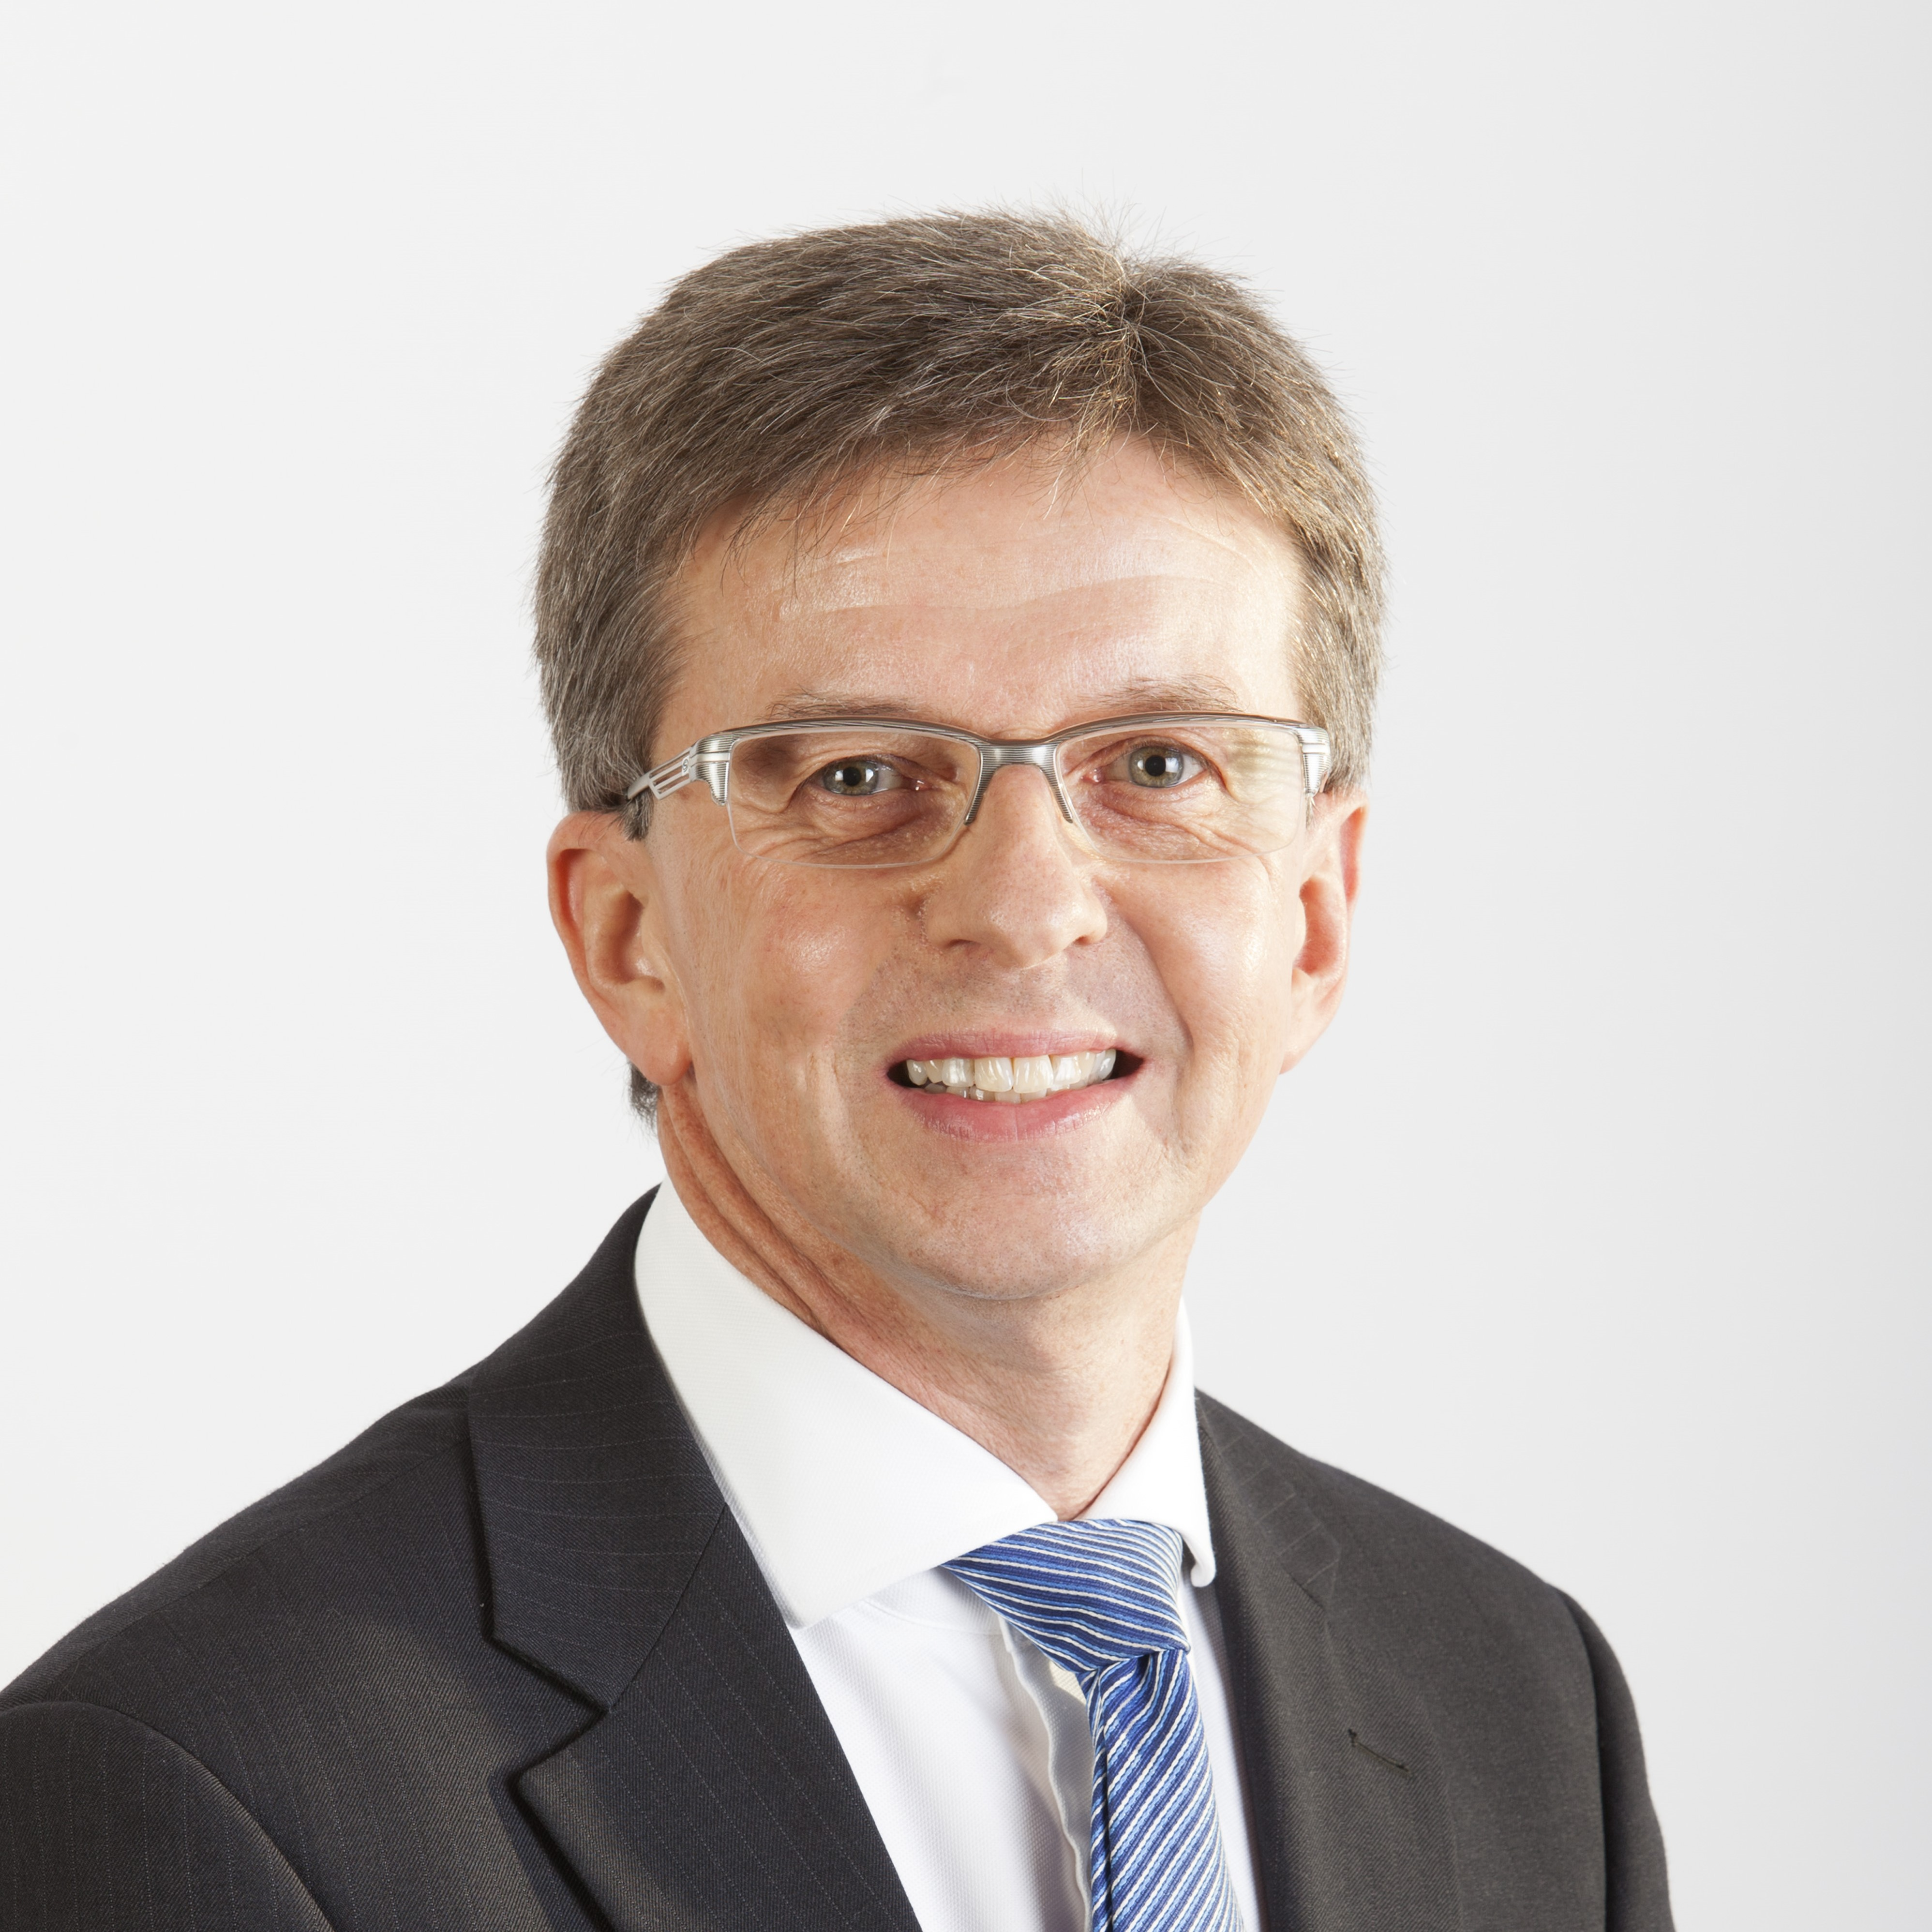 Nigel Gregory